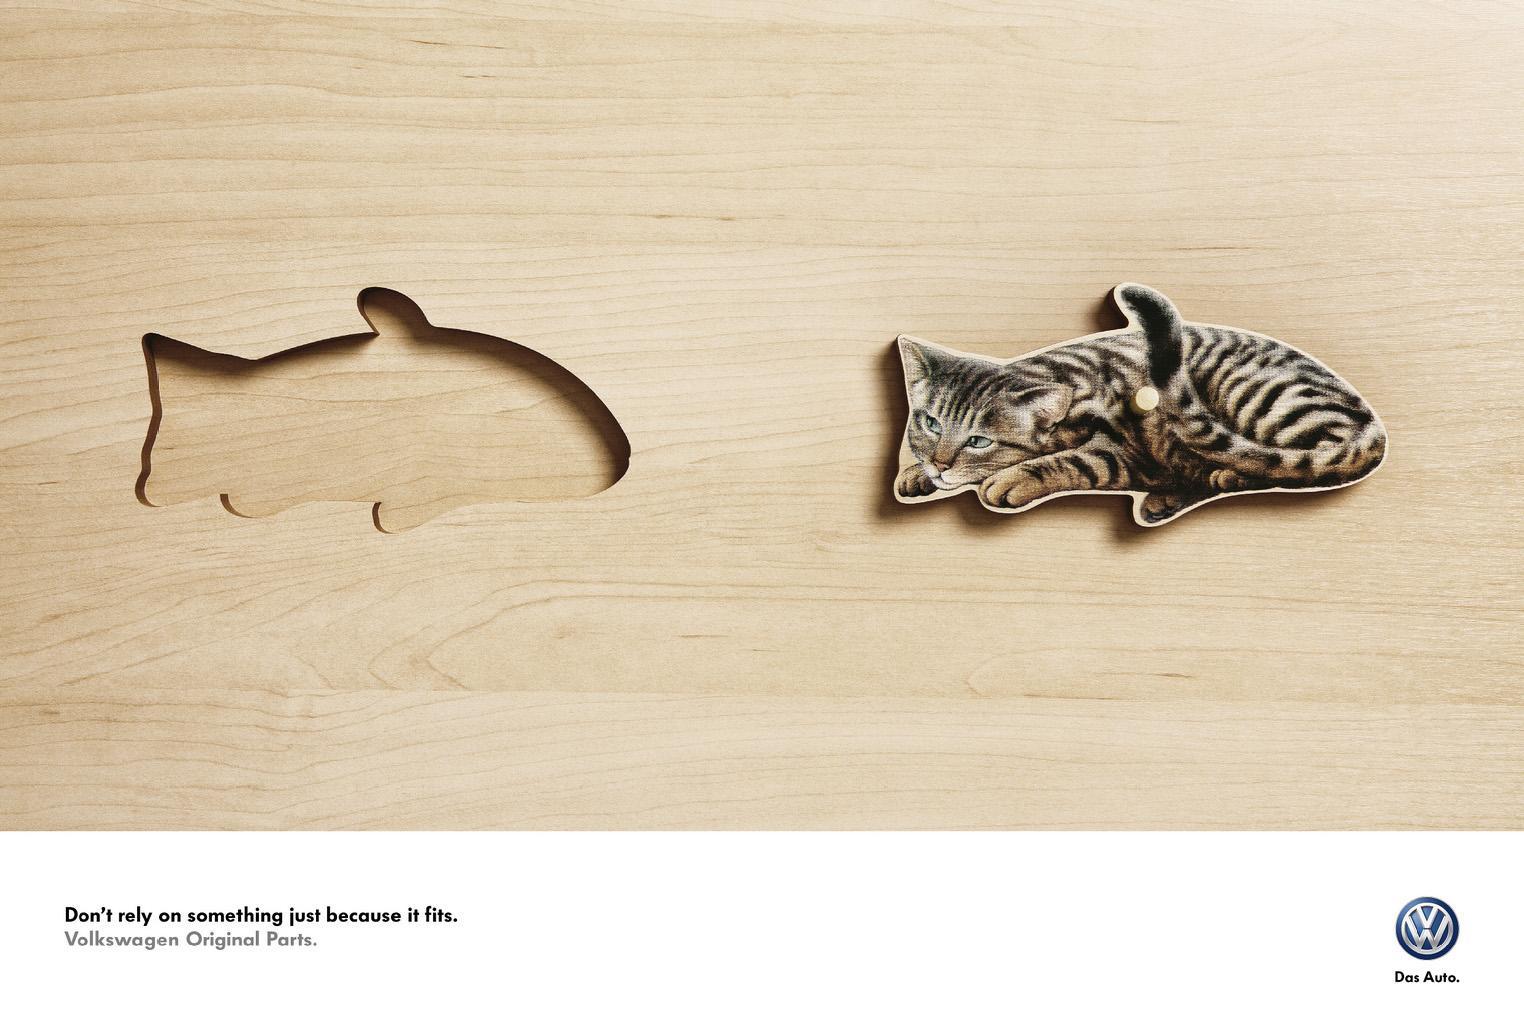 Volkswagen Outdoor Advert By BBDO: Cat | Ads of the World™